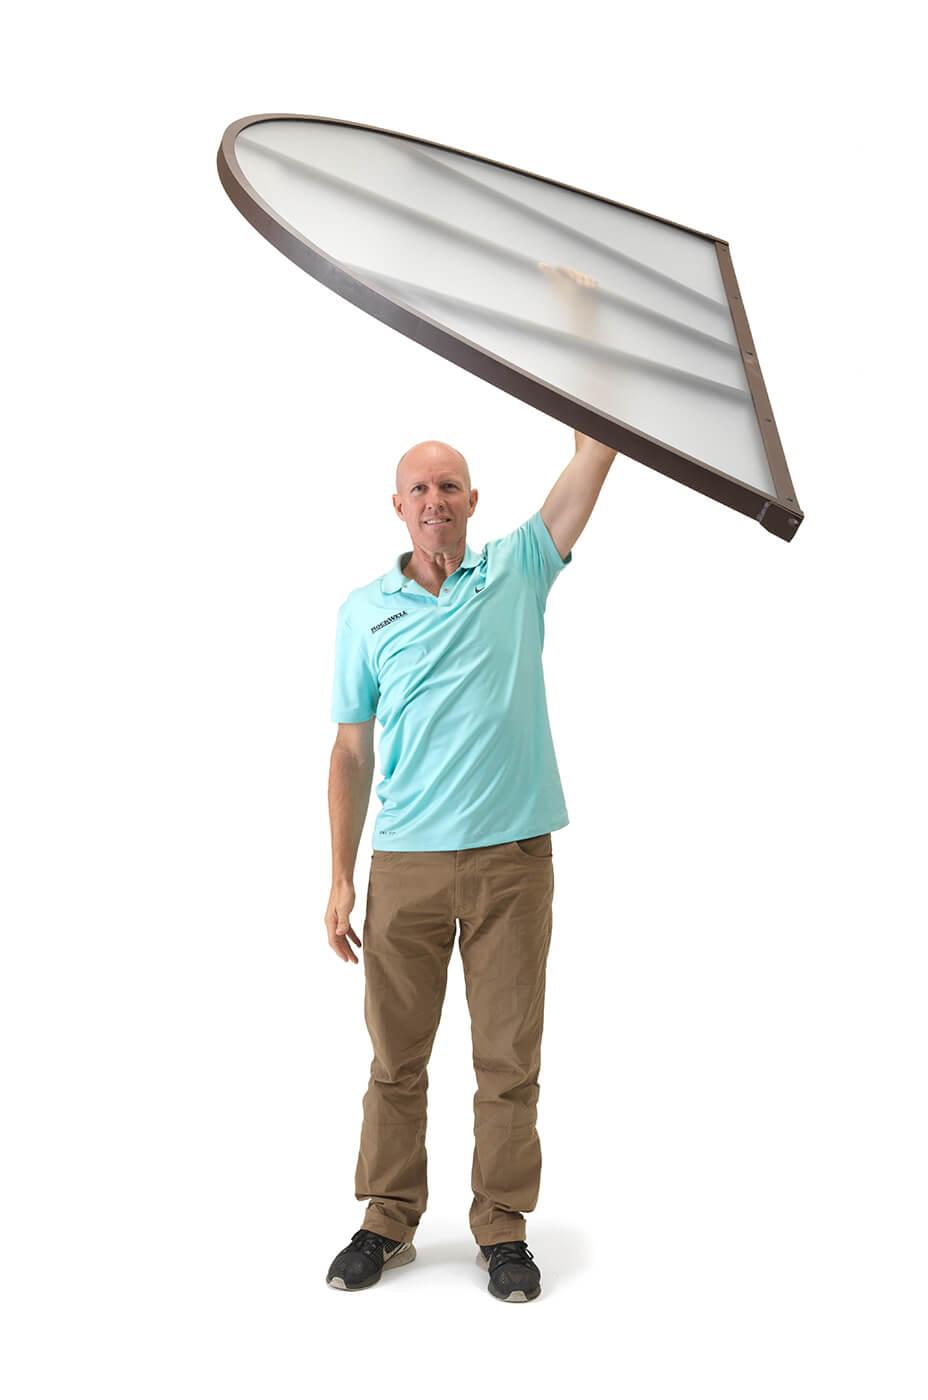 Man holding plastic window cover